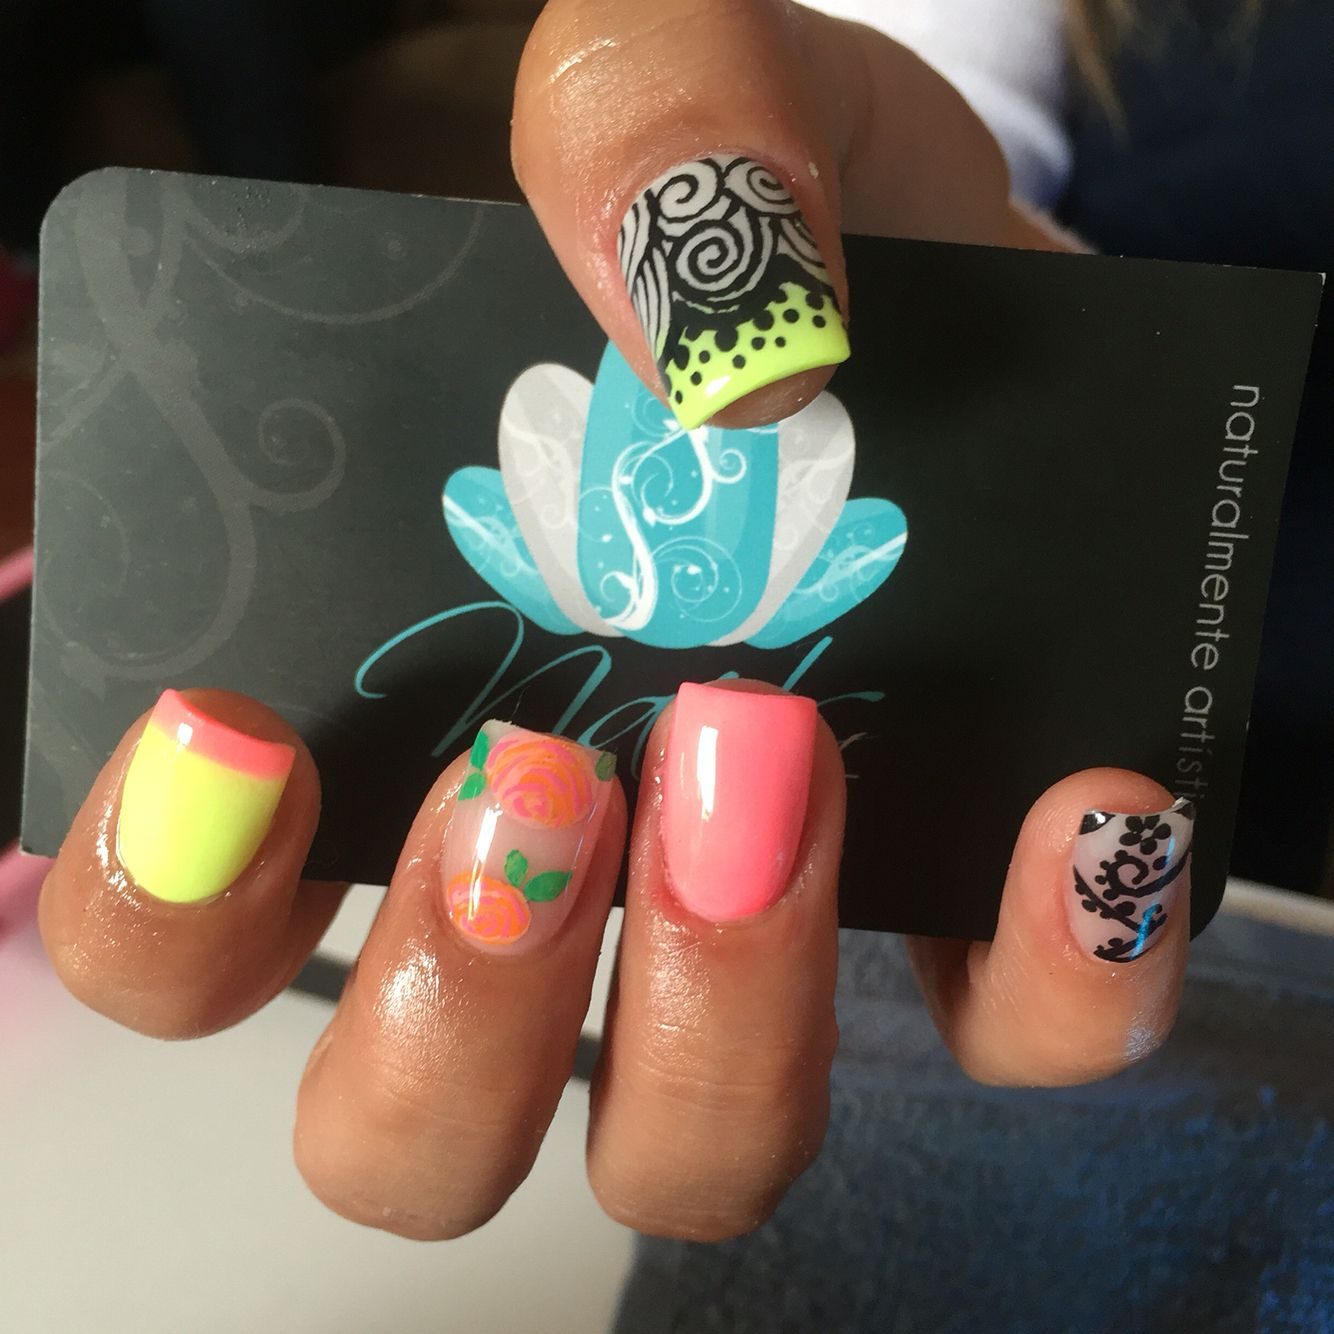 Acrylic nails nails art color nails nails pinterest color